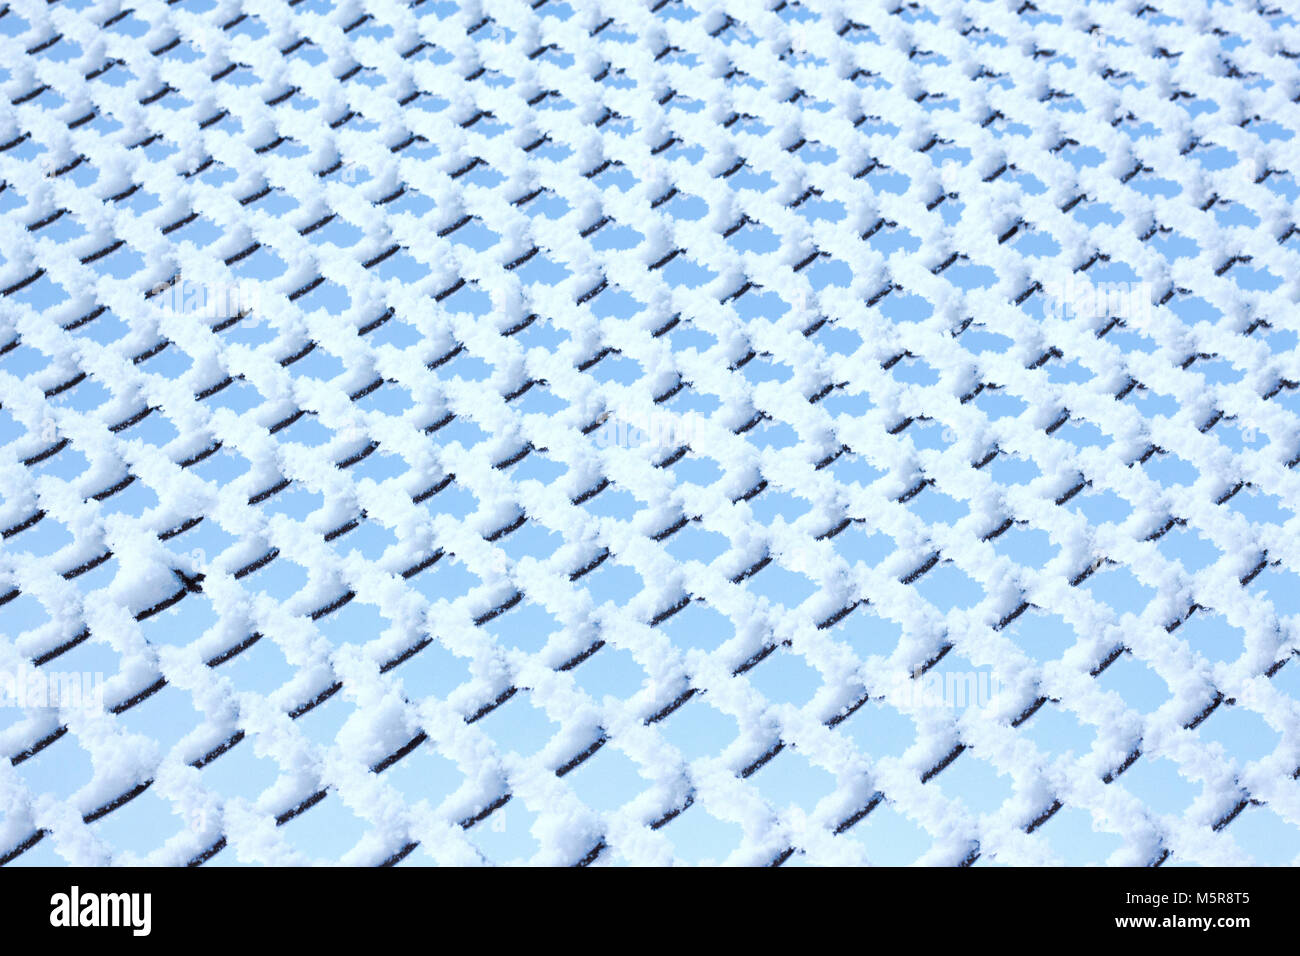 Rombos de metal en la textura de la valla de escarcha Foto de stock